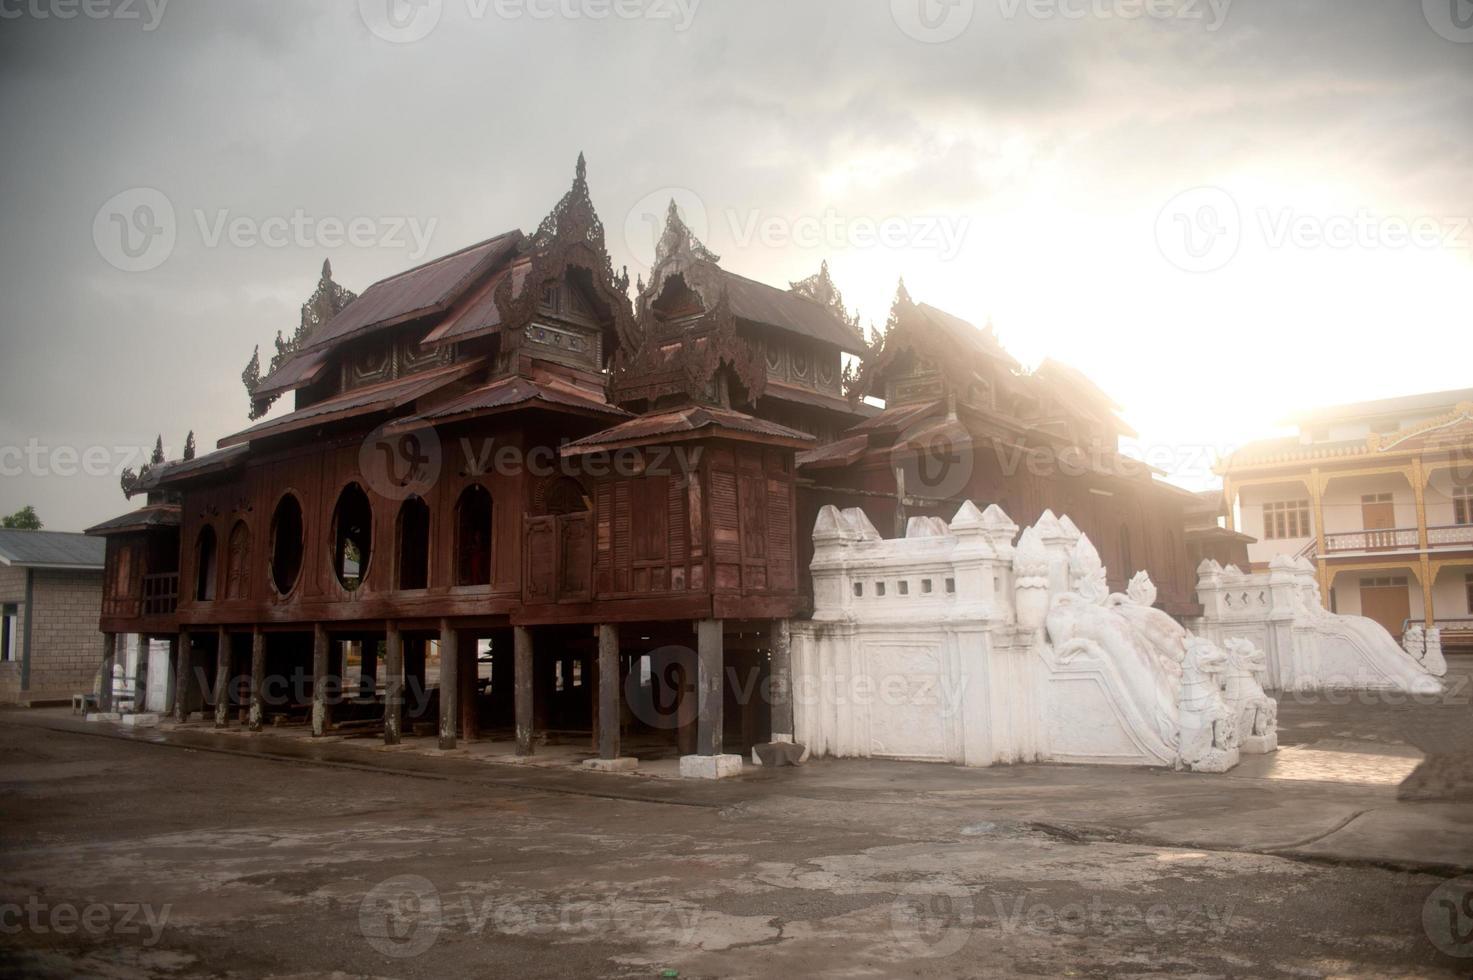 Iglesia de madera del templo nyan shwe kgua en myanmar. foto